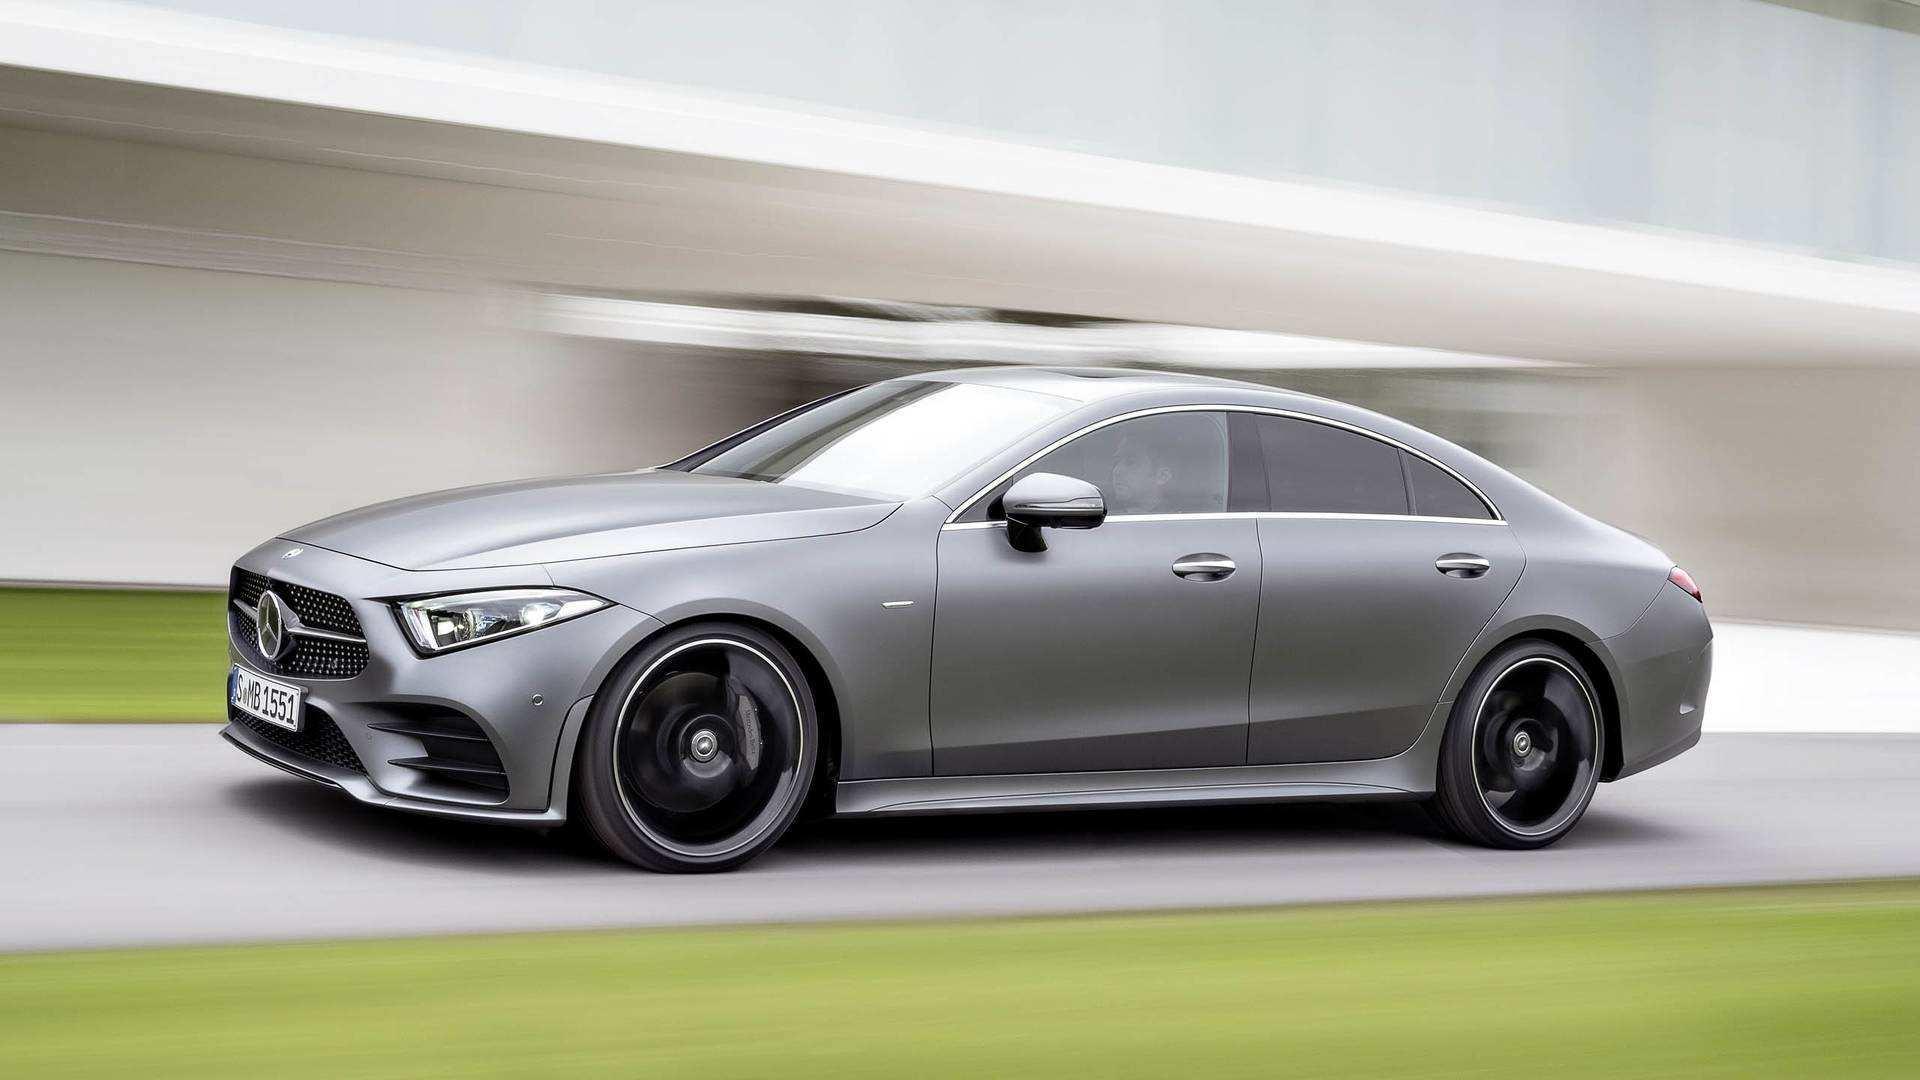 92 Concept of Mercedes 2019 Cls Exterior for Mercedes 2019 Cls